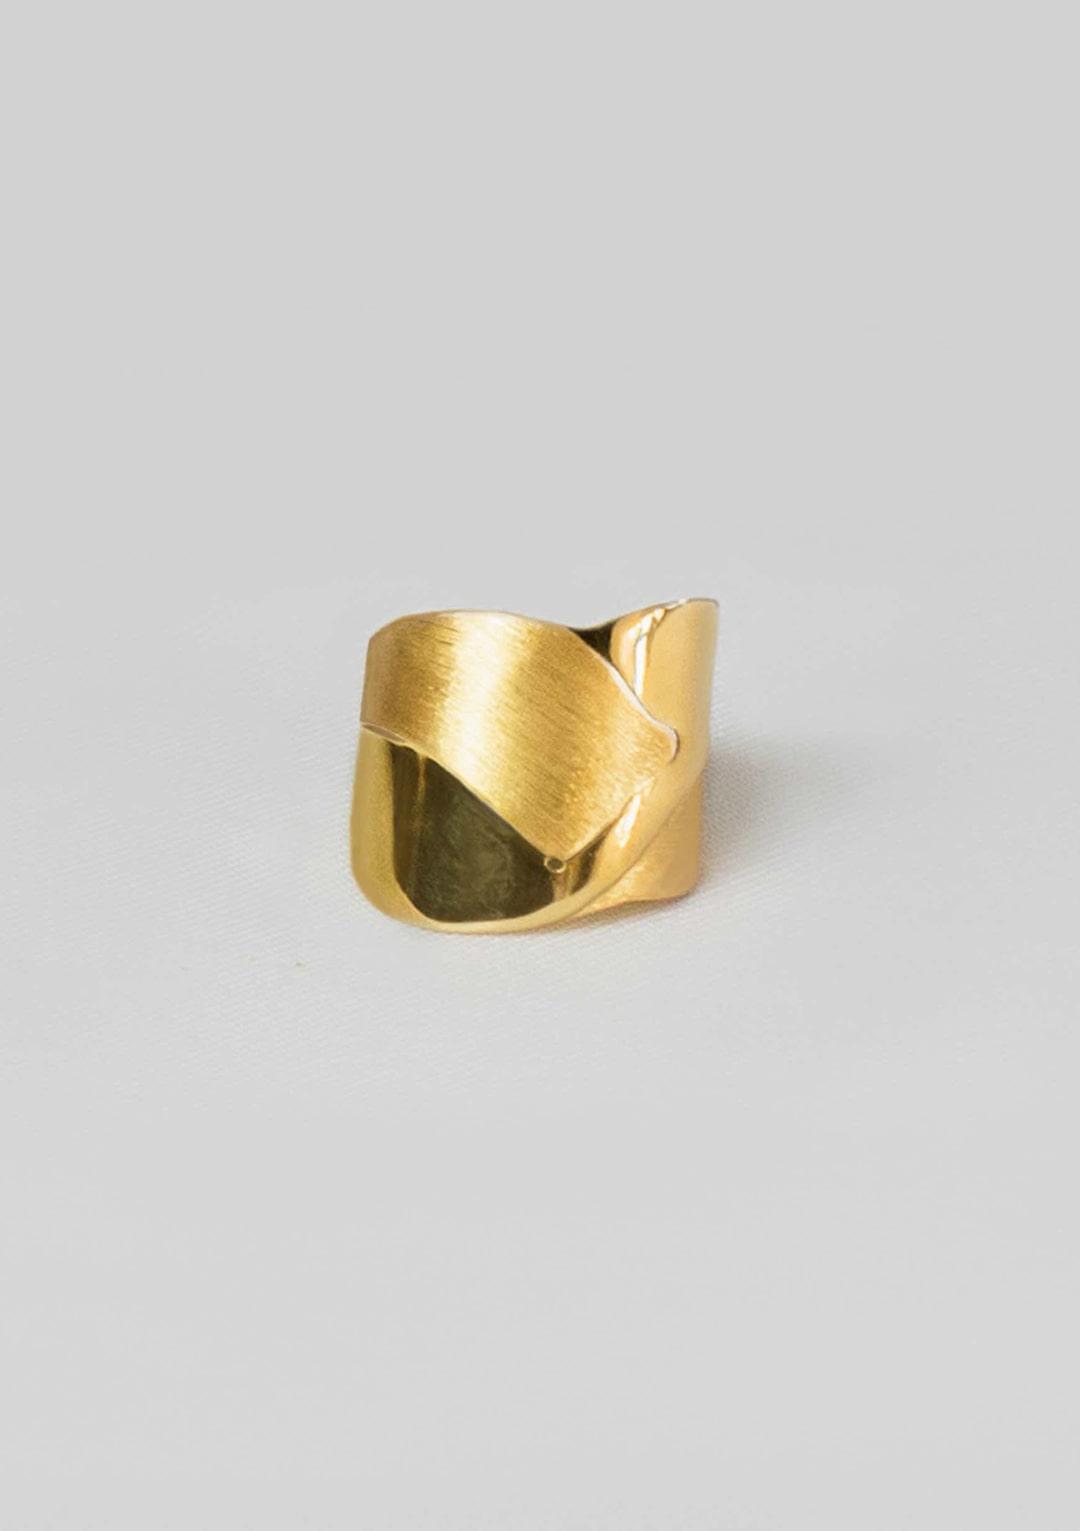 bague intemporelle bi-texturée I argent massif doré or 18 carats I Elliade bijoux I vue en détail I Label AÉ Paris